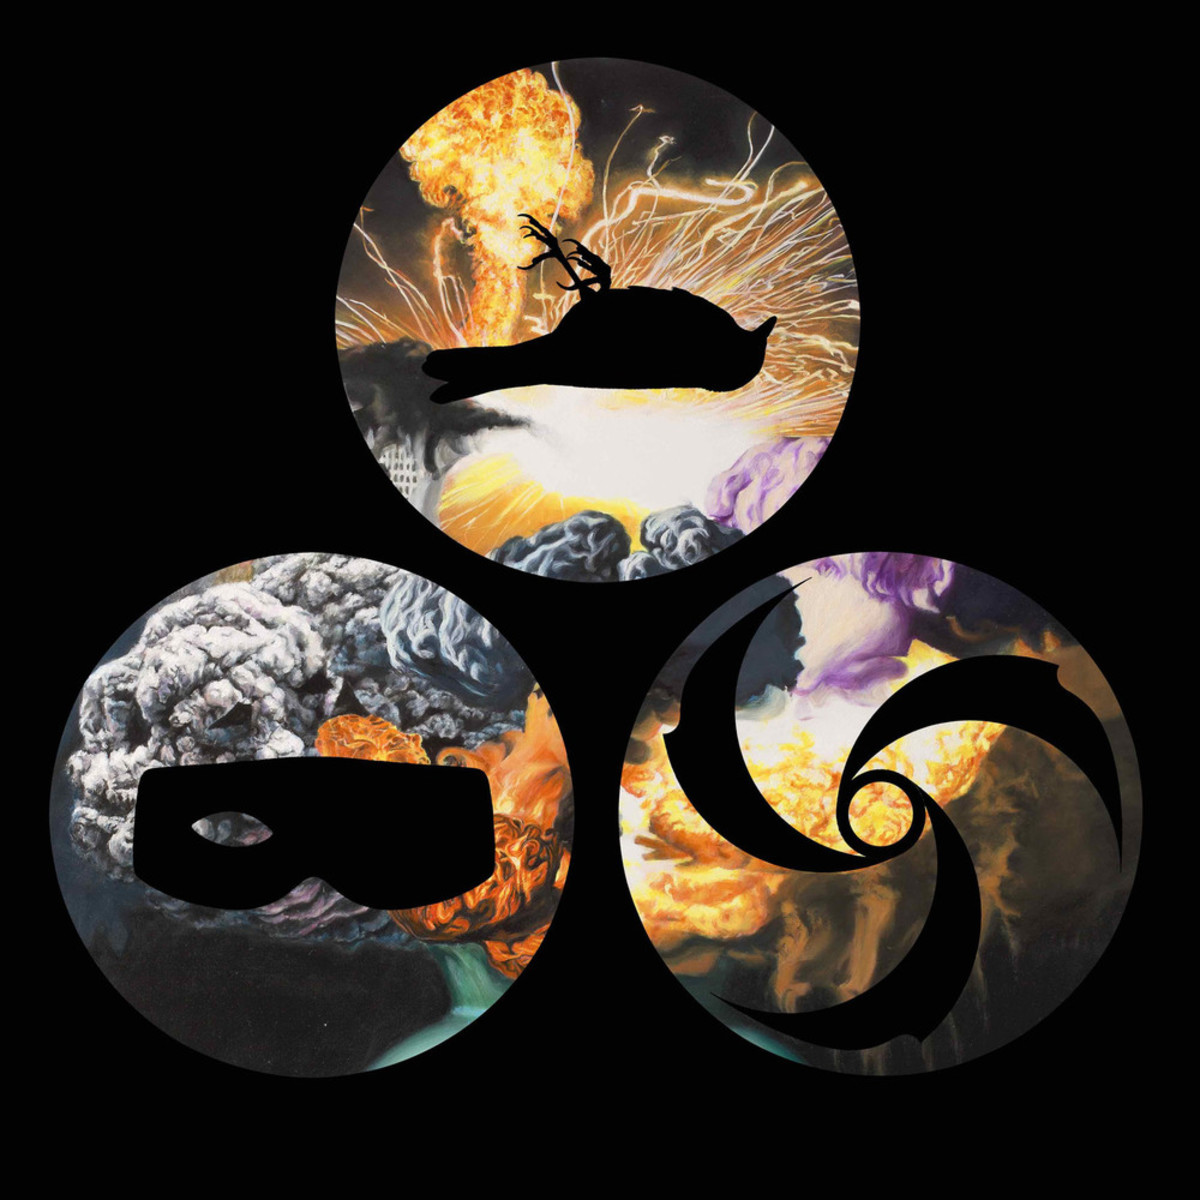 Nevermen album art, property of Ipecac Recordings.